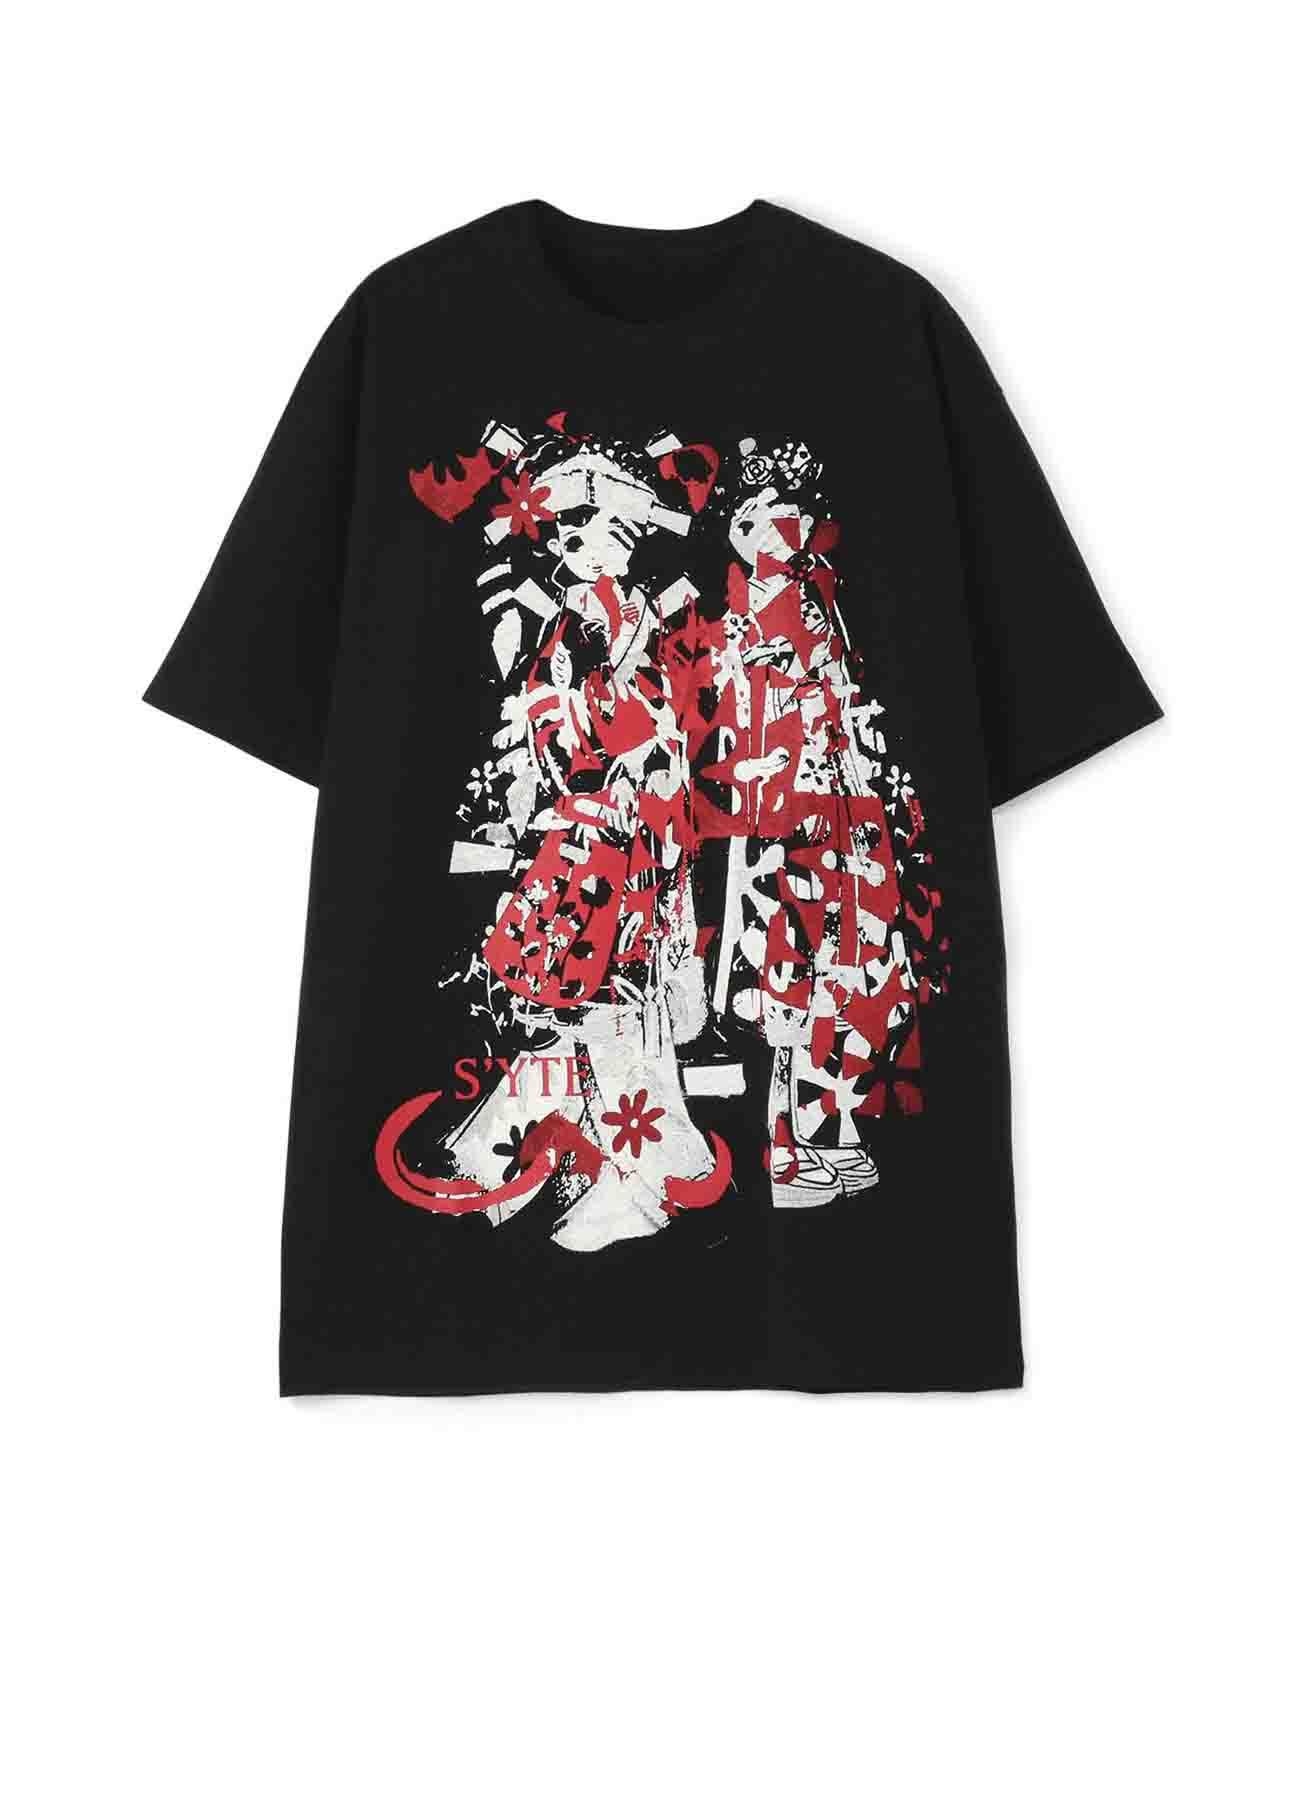 20/CottonJersey Dress Kimono Paper Doll T-Shirt